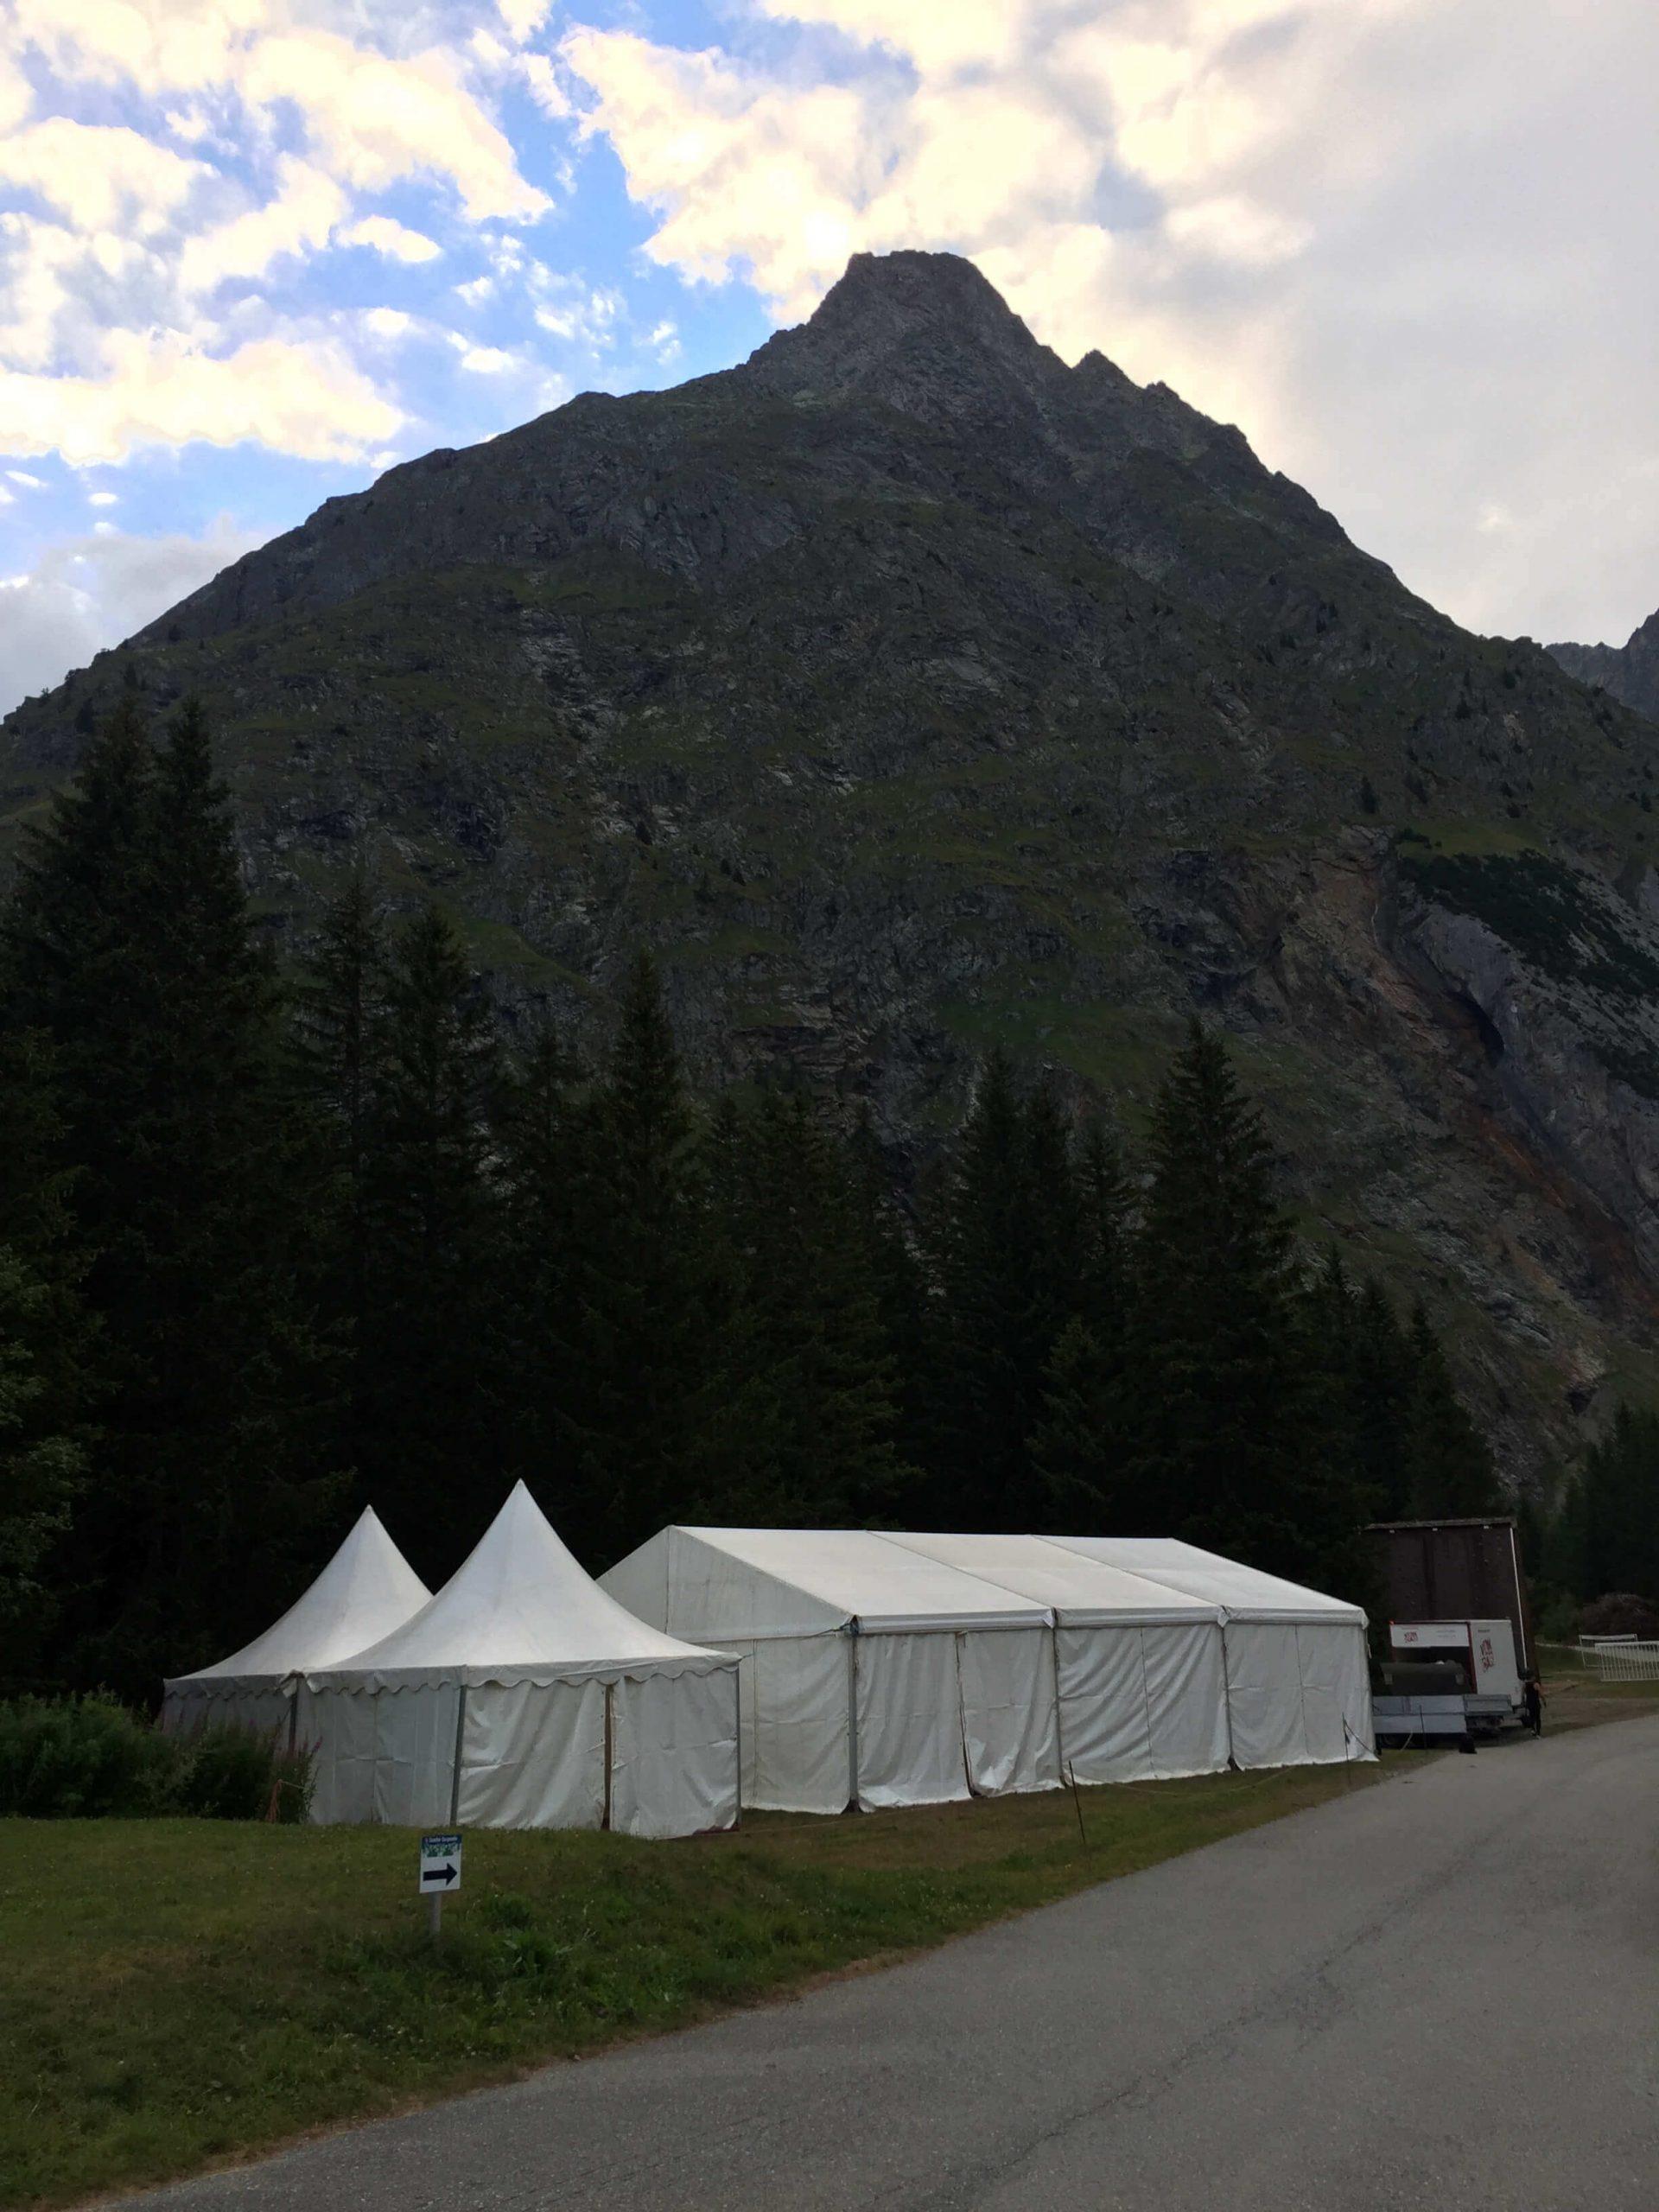 Carpas de almacenamiento top tent